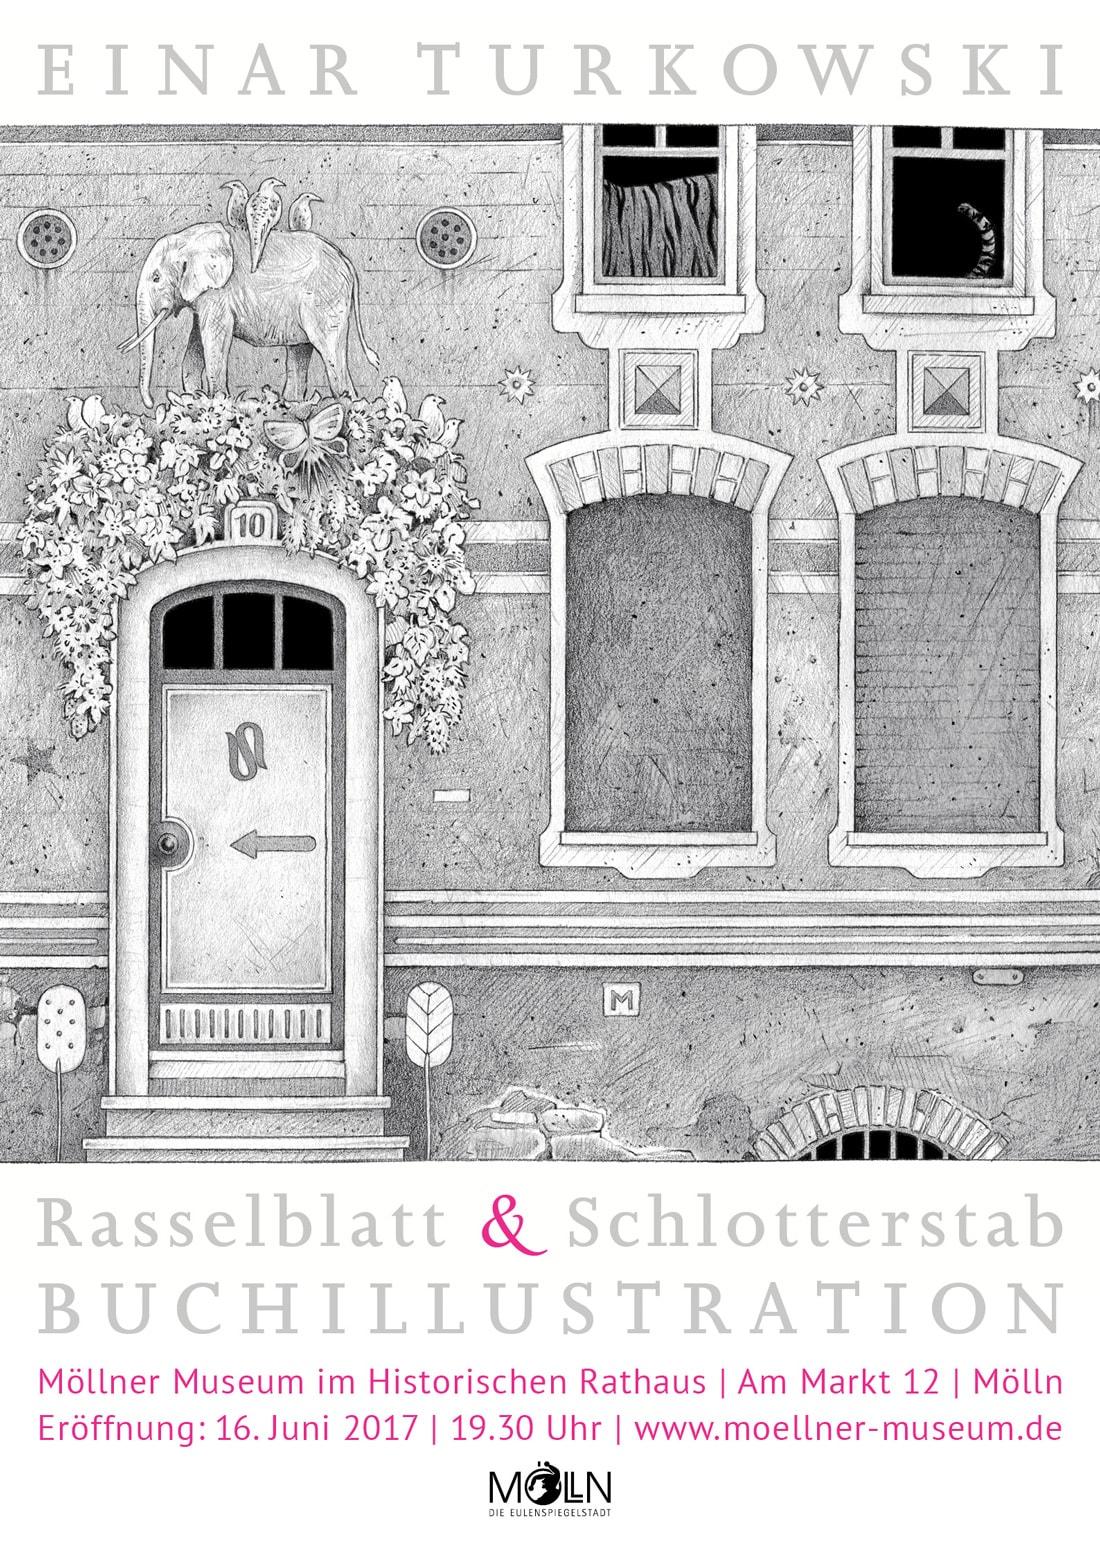 EINAR TURKOWSKI – RASSELBLATT & SCHLOTTERSTAB